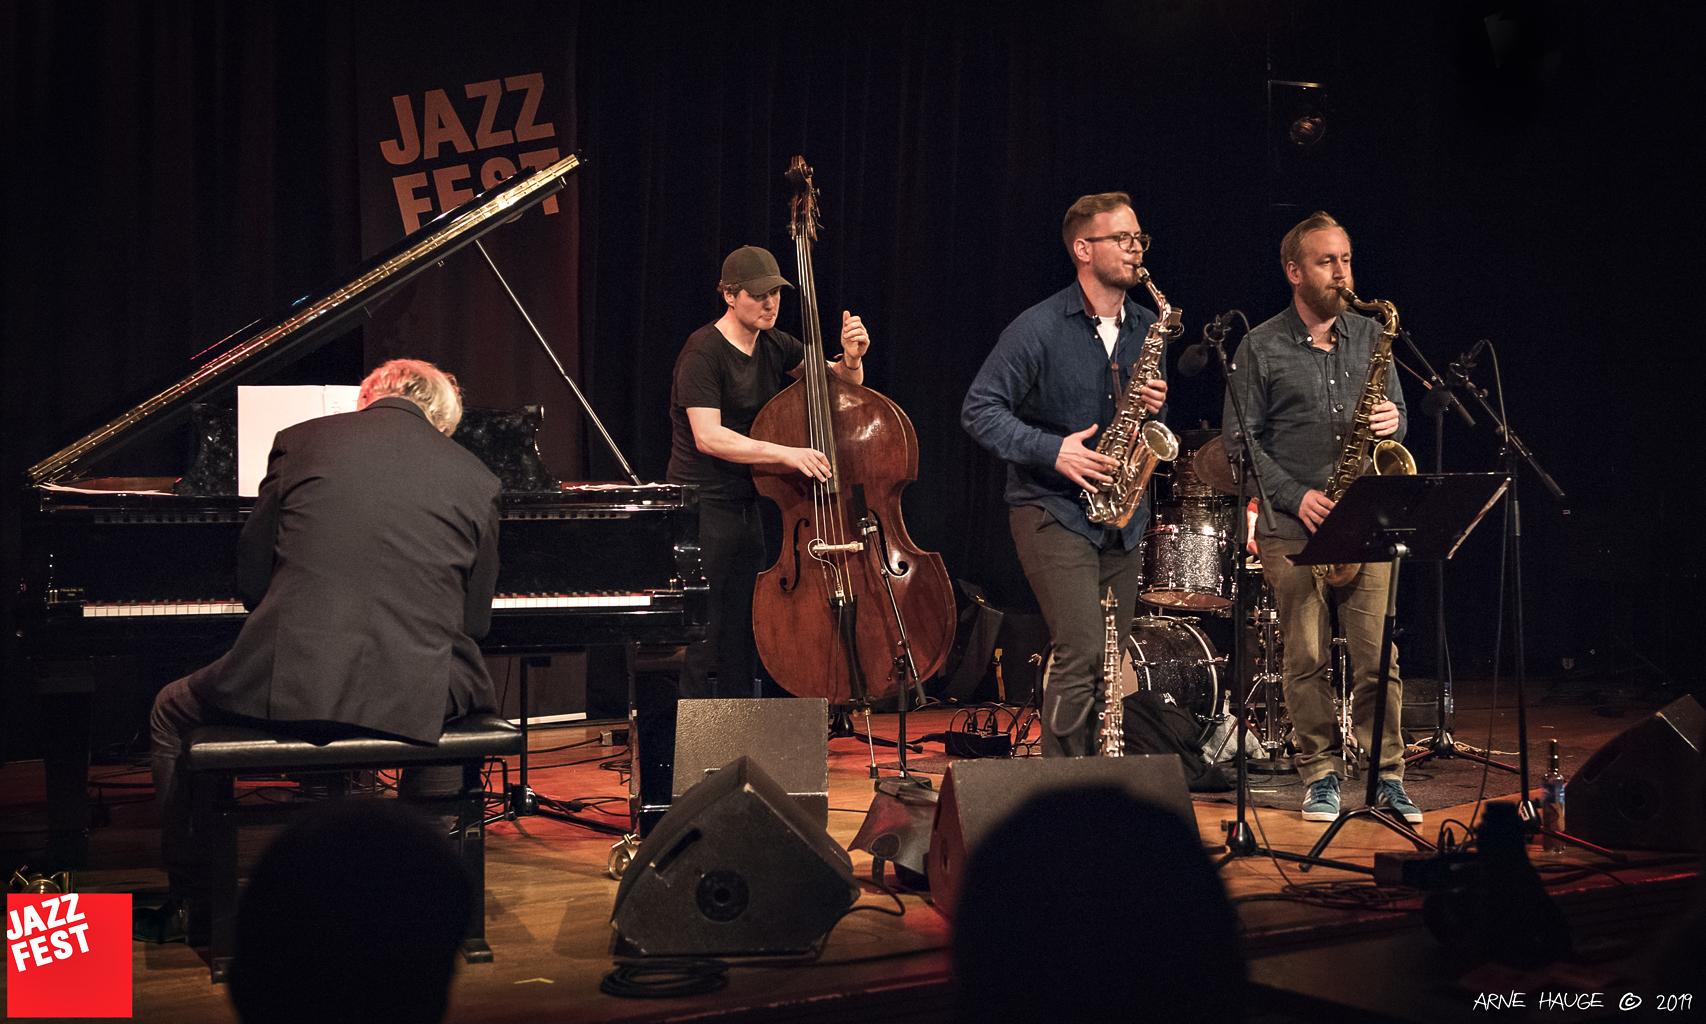 190509 Hegge (Jazz Expo) @ Dokkhuset - foto Arne Hauge_014.jpg